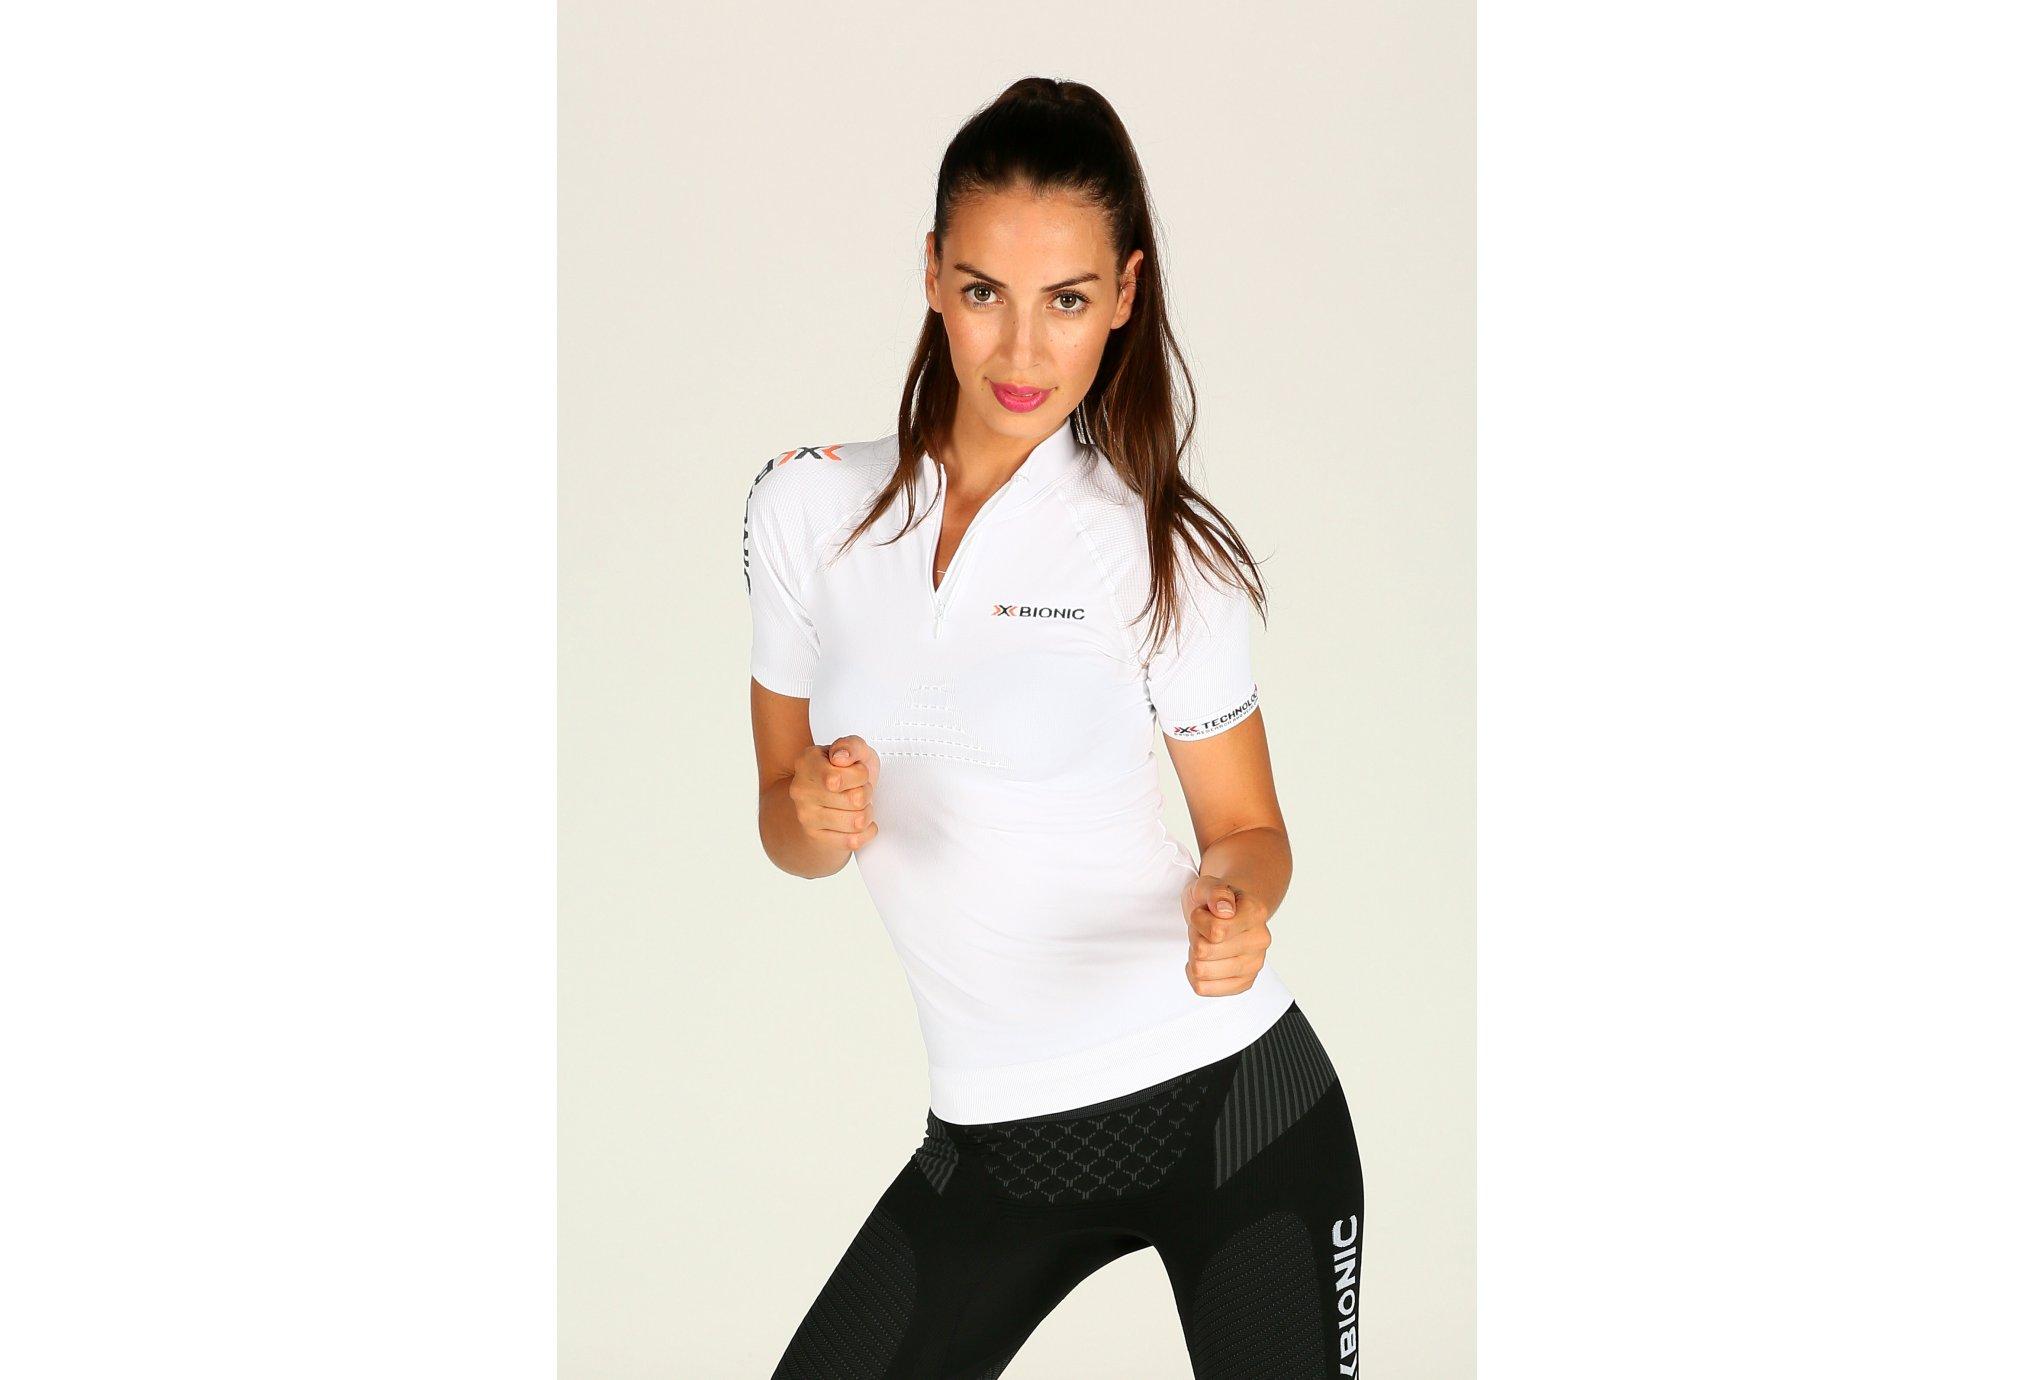 X-Bionic Tee-shirt Bike Race BT 2.2 W Diététique Vêtements femme